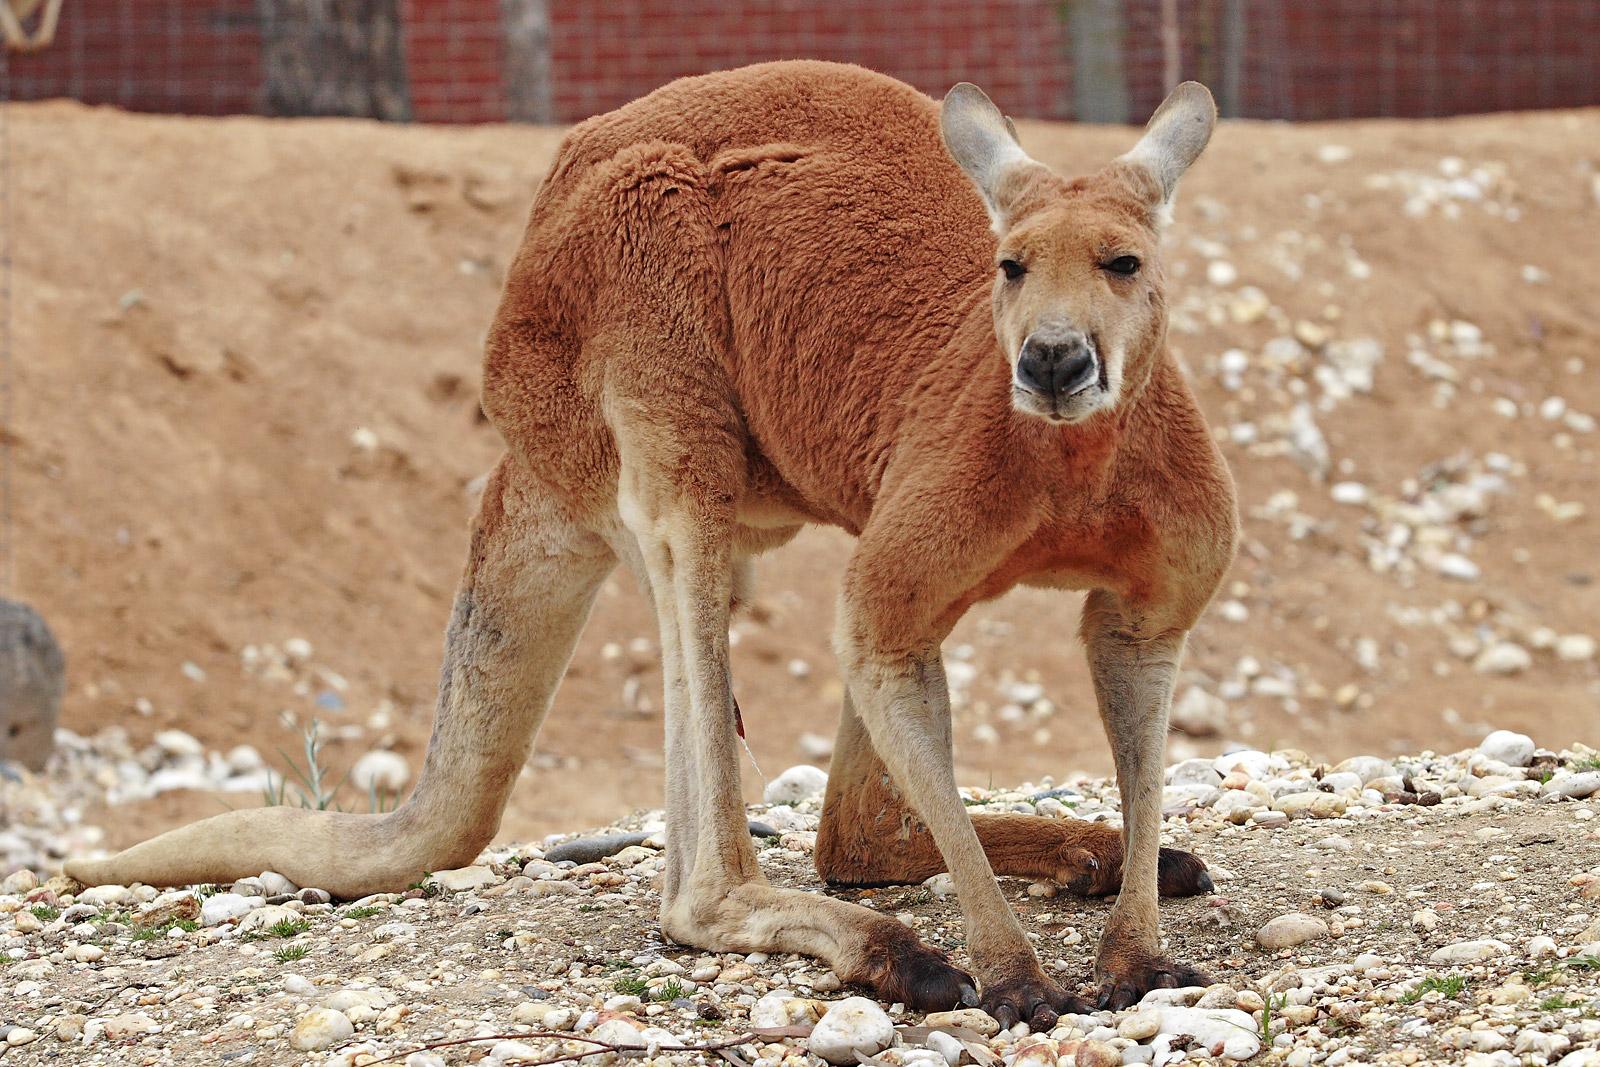 Male red kangaroo (Macropus rufus) at the Melbourne Zoo. Photo taken on November 22, 2006.